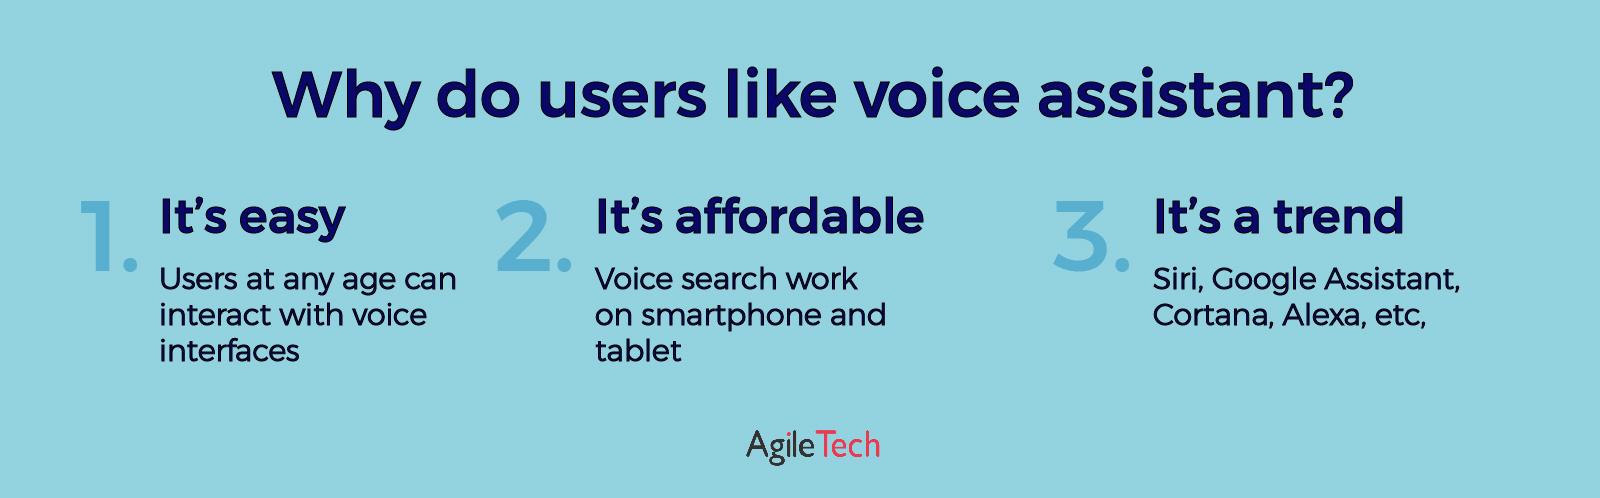 voice search web development trends 2020